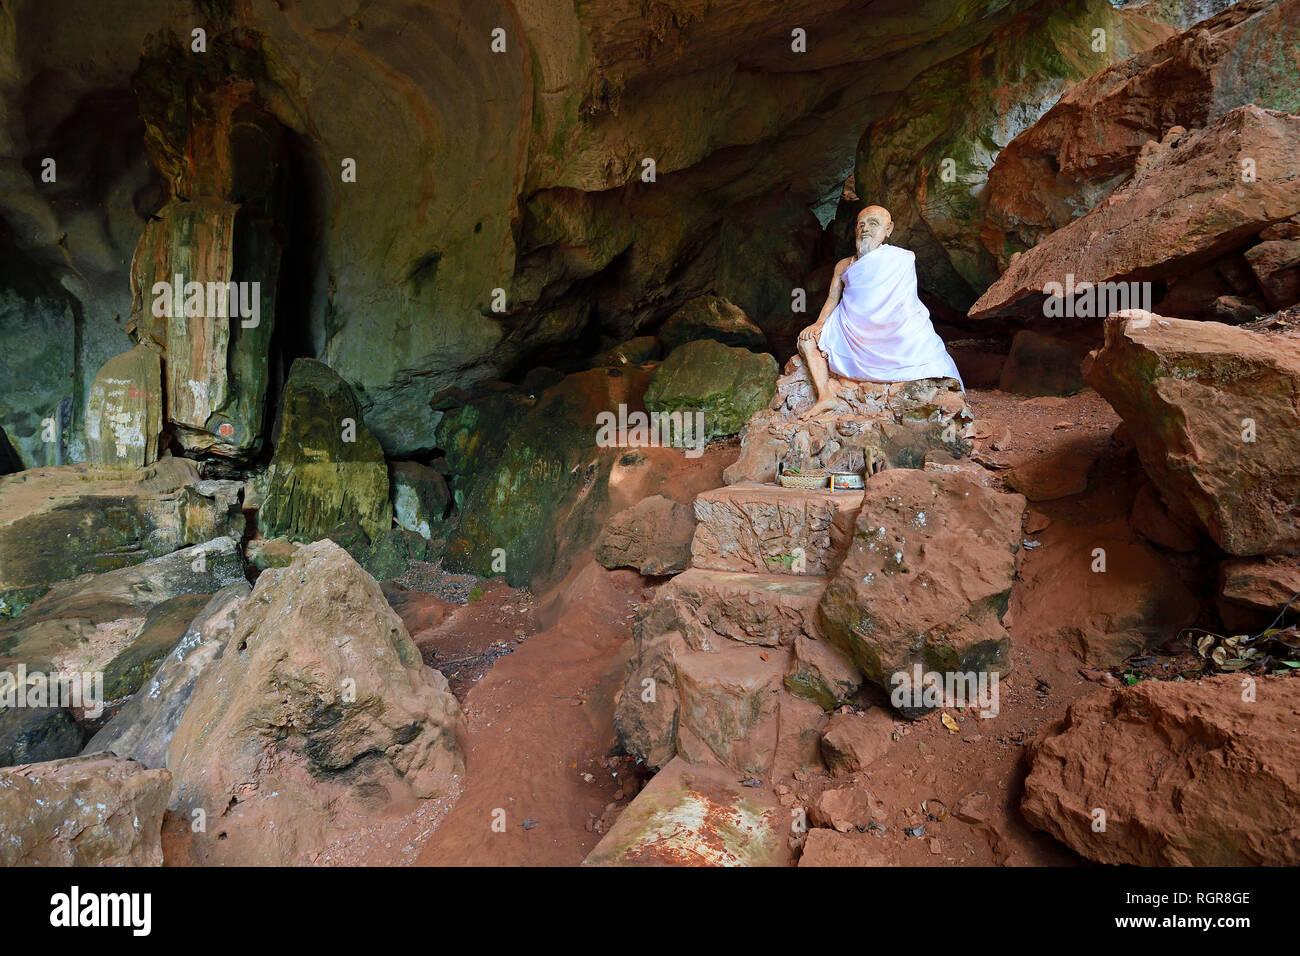 sitzende Statue eines Moenchs, Hoehlentempel Wat Tham Suwan Khuha, Phang Nga, Thailand - Stock Image